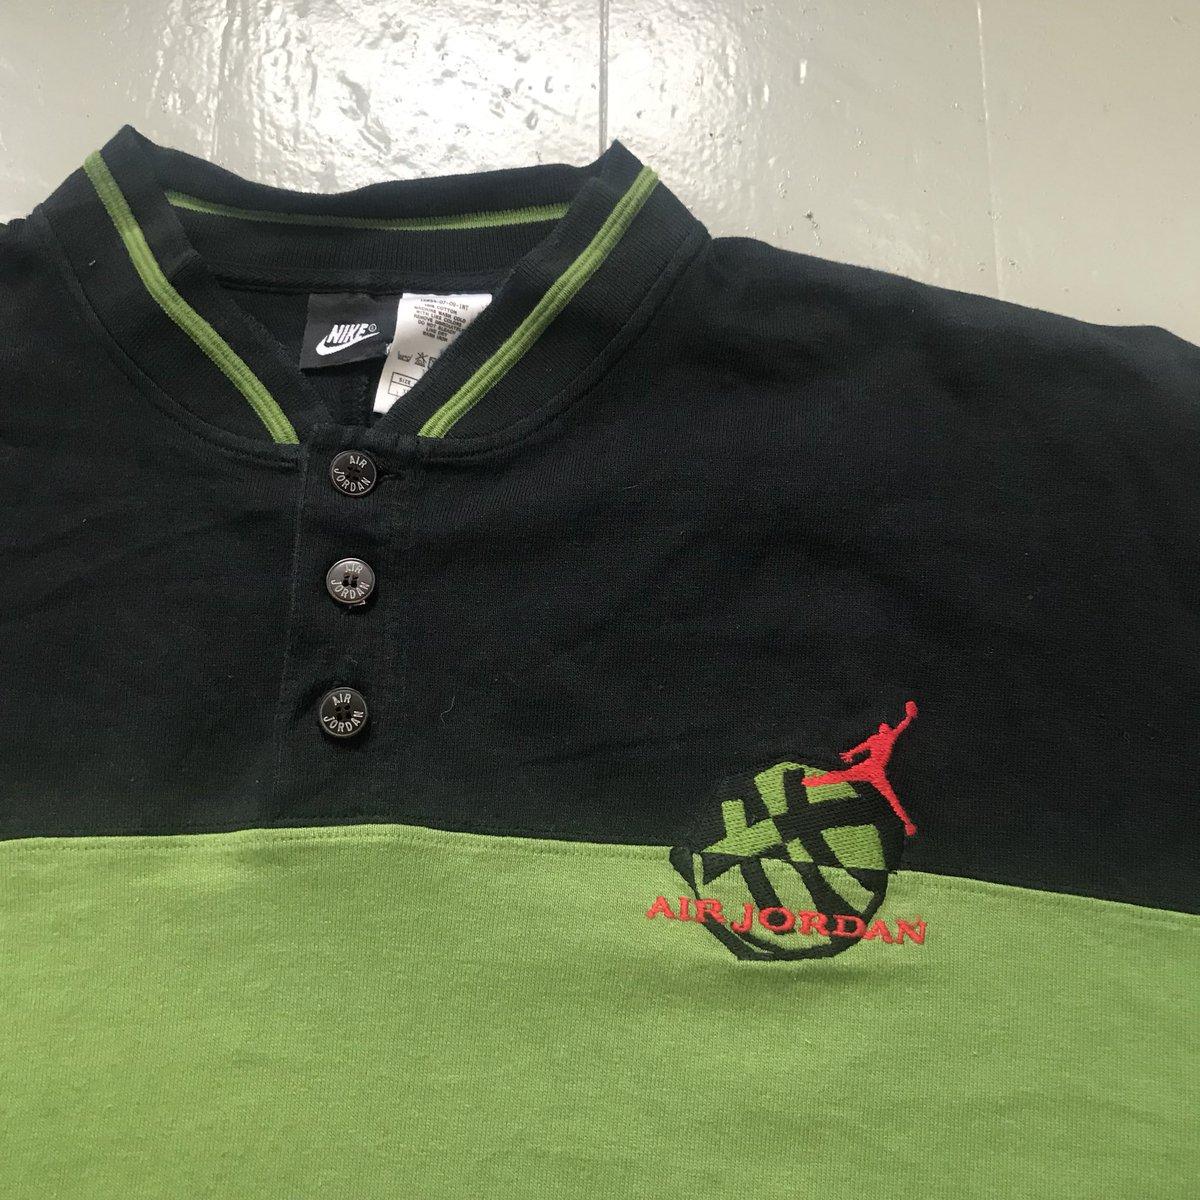 ce24c2369cd Nike Air Jordan Polo Shirt Size - XL Price - £25 #Nike #NikeAirJordan # AirJordan #Jordans #USA #Italy #Italian #Shirts #Shirt #Sport #Menswear # Tops #Top ...